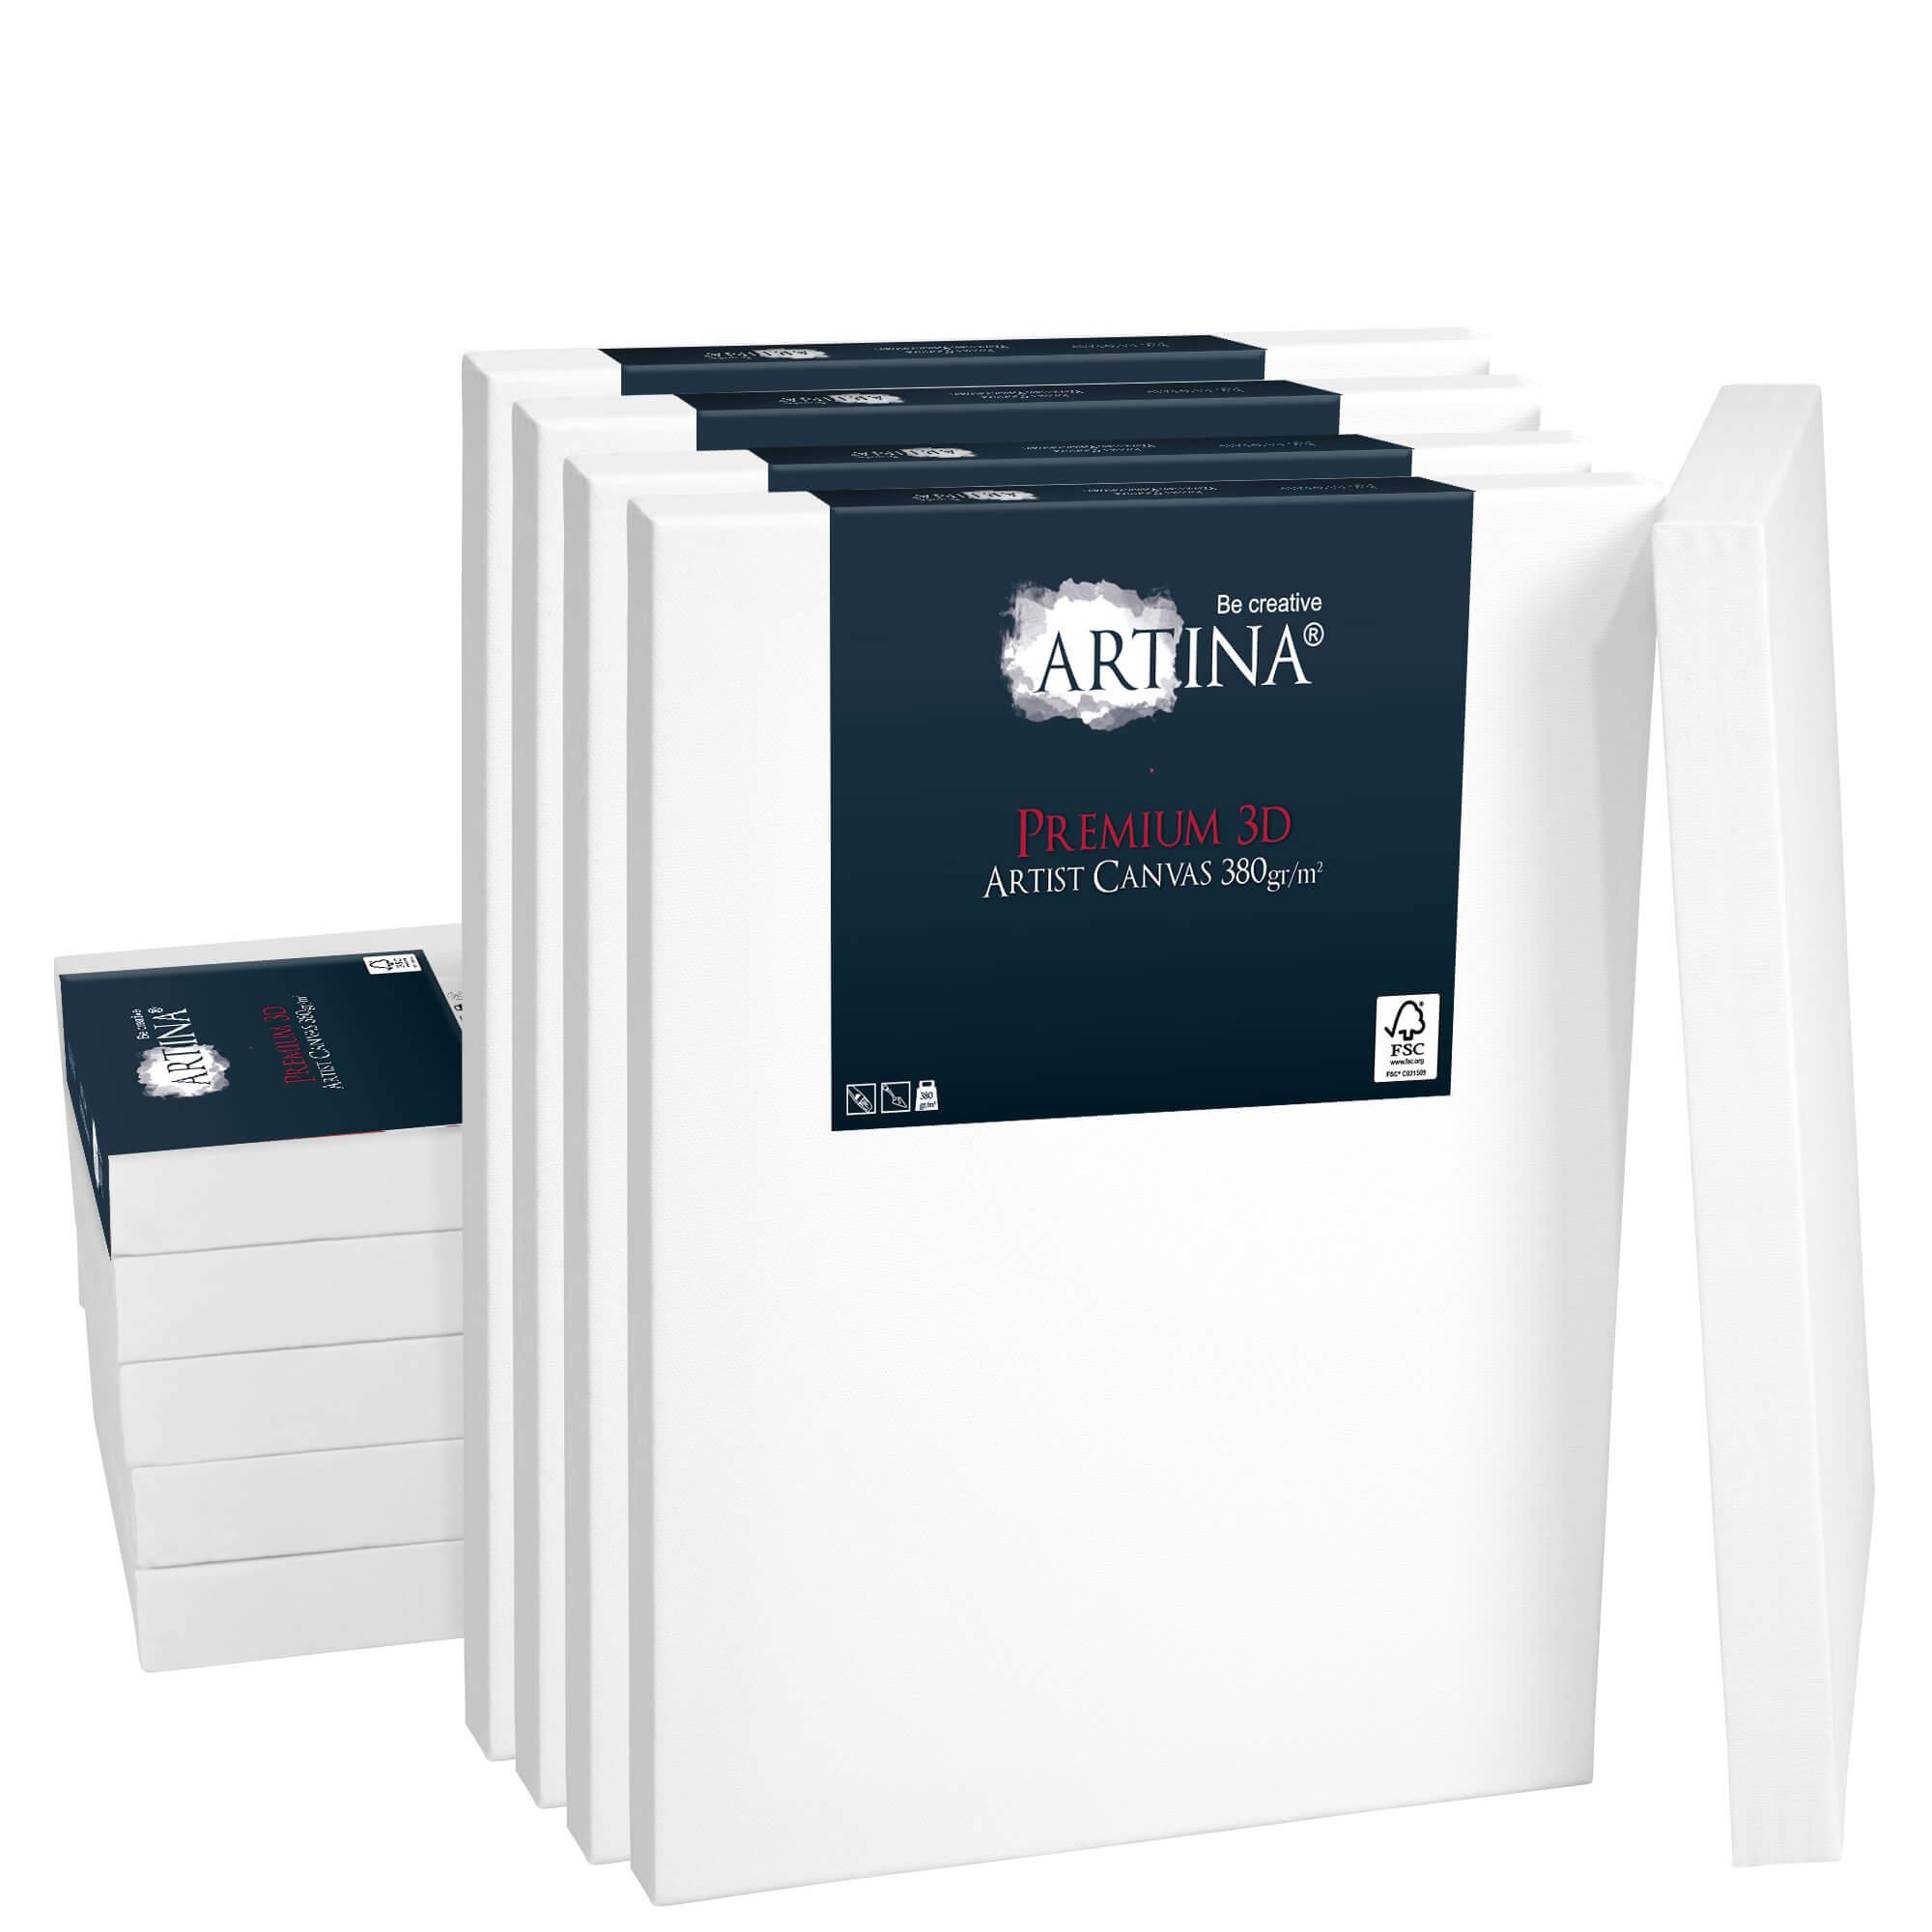 10er Set Artina 3D Premium 380g/m² Leinwand auf Keilrahmen -div Größen